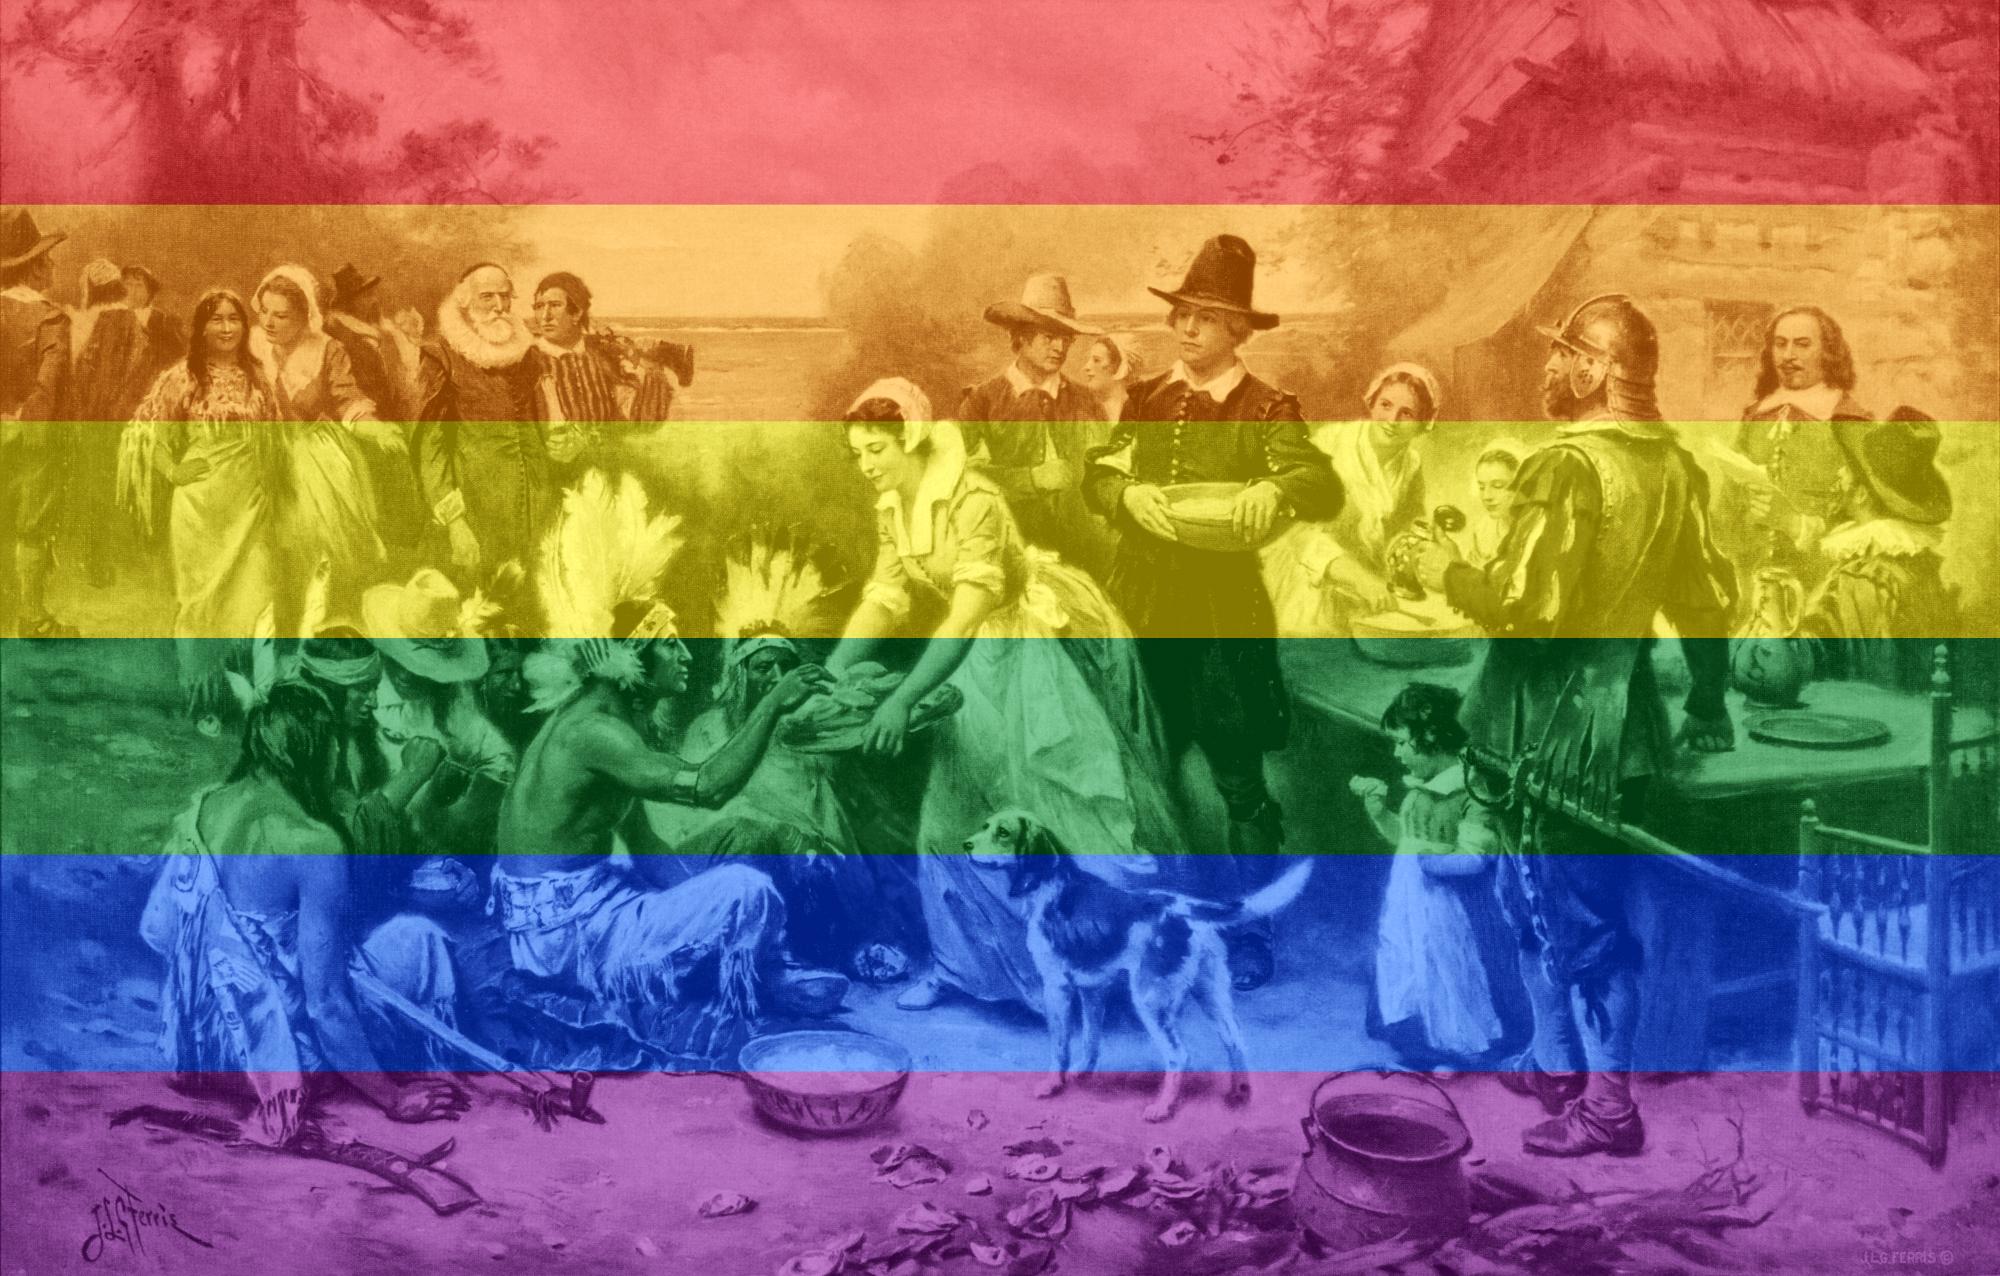 The pilgrims gay or lesbian sex